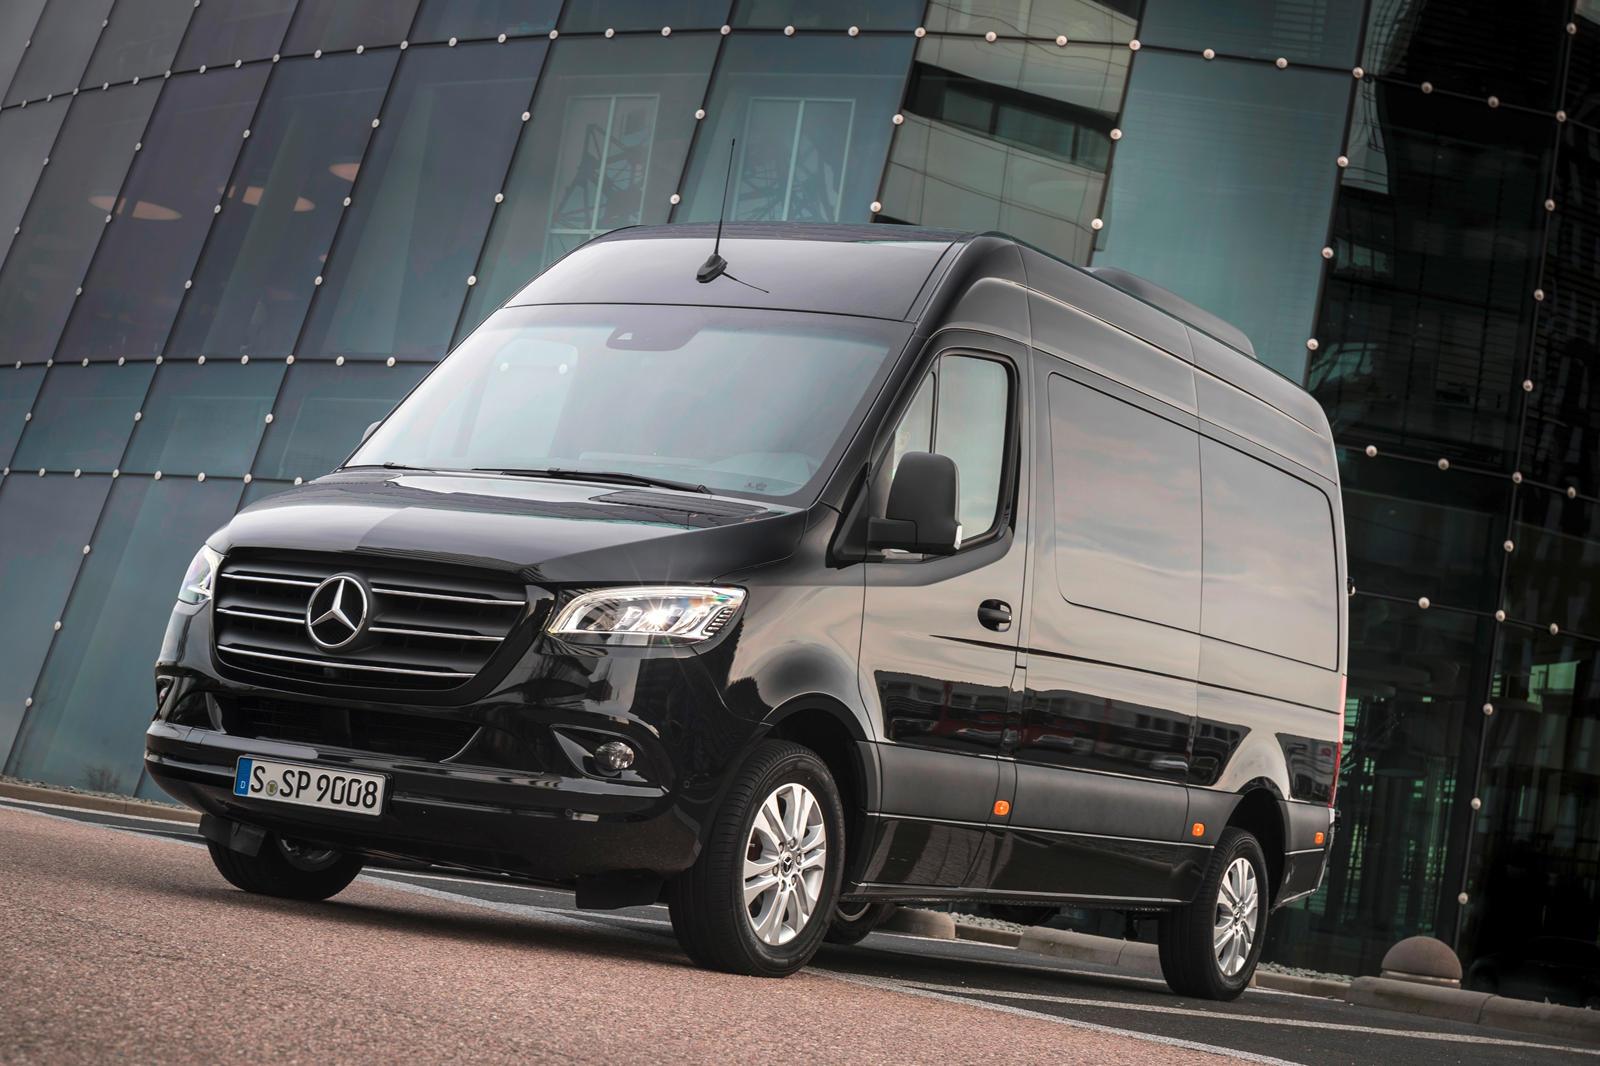 2020 Mercedes Benz Sprinter Passenger Van Review Trims Specs Price New Interior Features Exterior Design And Specifications Carbuzz